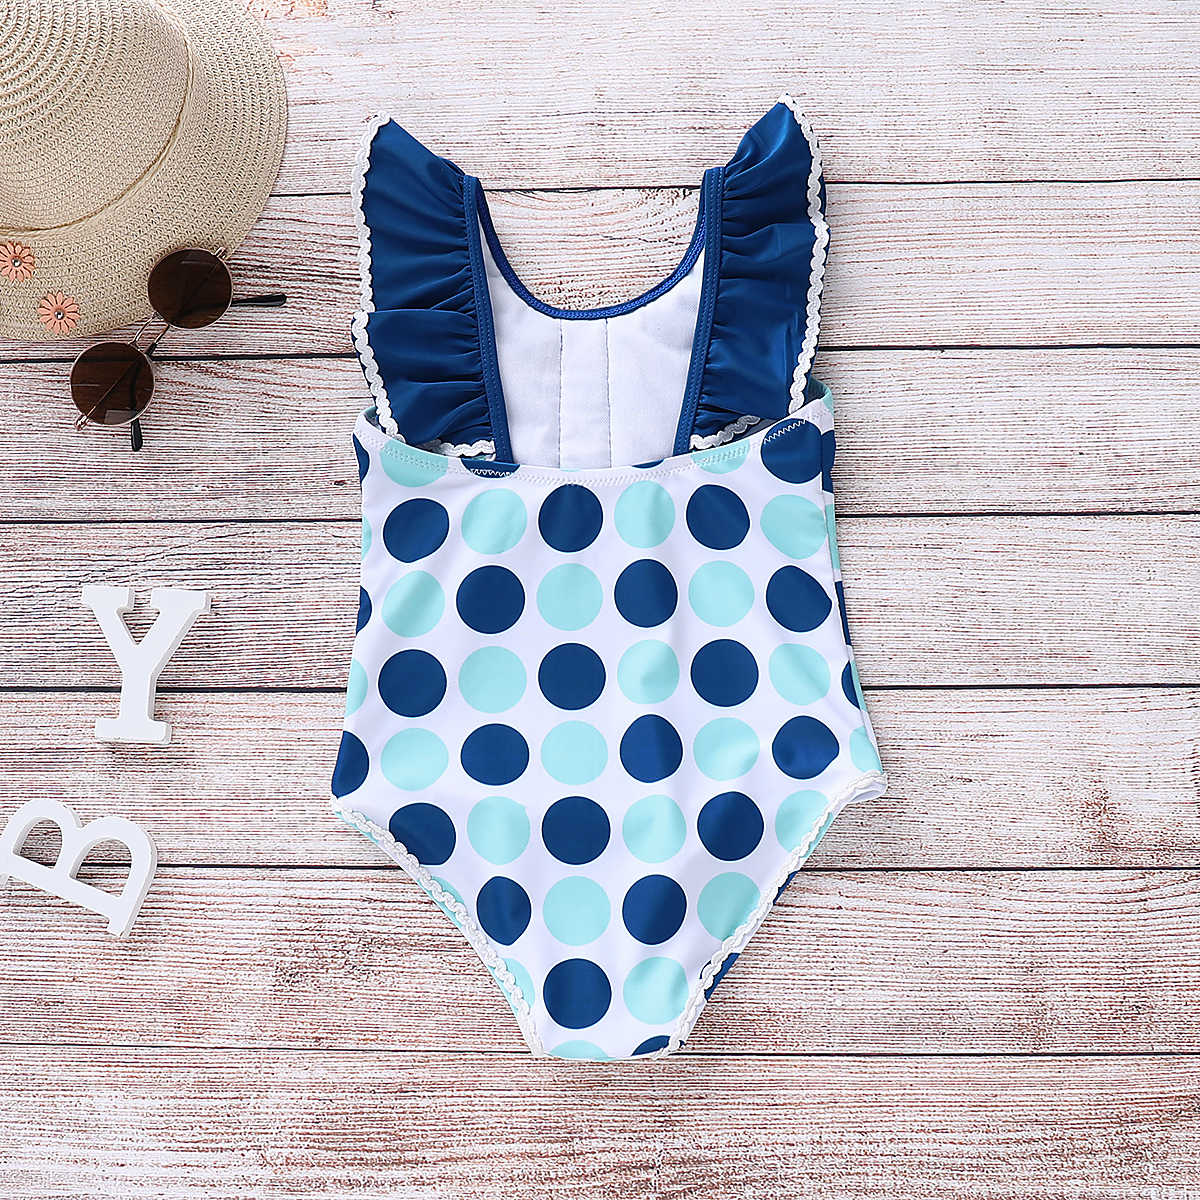 2019 Summer Kids Baby Girl Swimwear One Piece Bikini Swimsuit Bathing Suit Beachwear Children Swimming Clothes